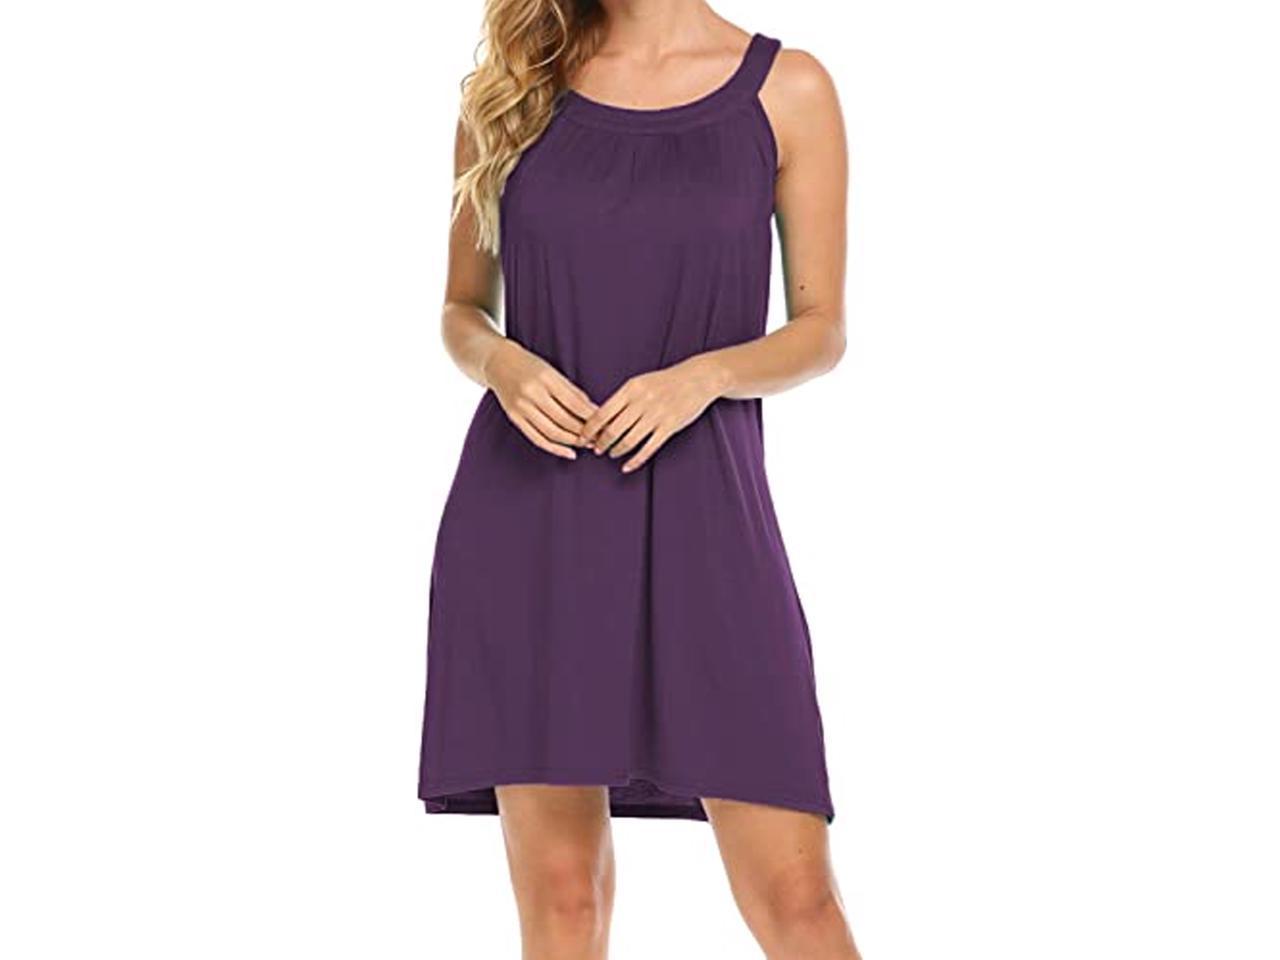 Beach Boho Strappy Sundress  Mini Dress  Beachwear  Lightweight Cotton  Size S